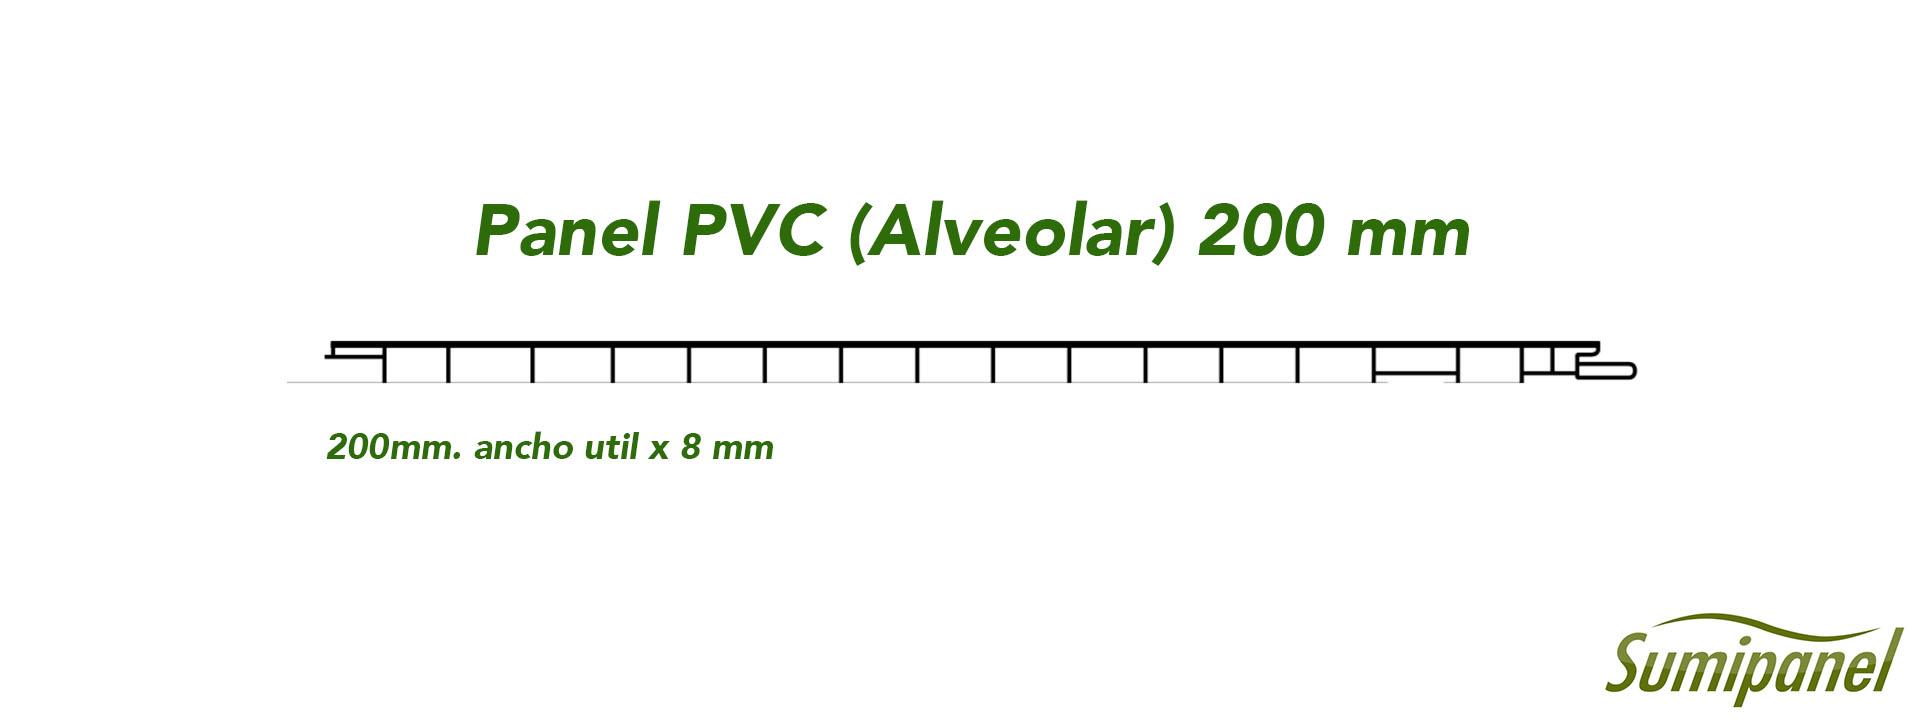 Panel PVC Alveolar